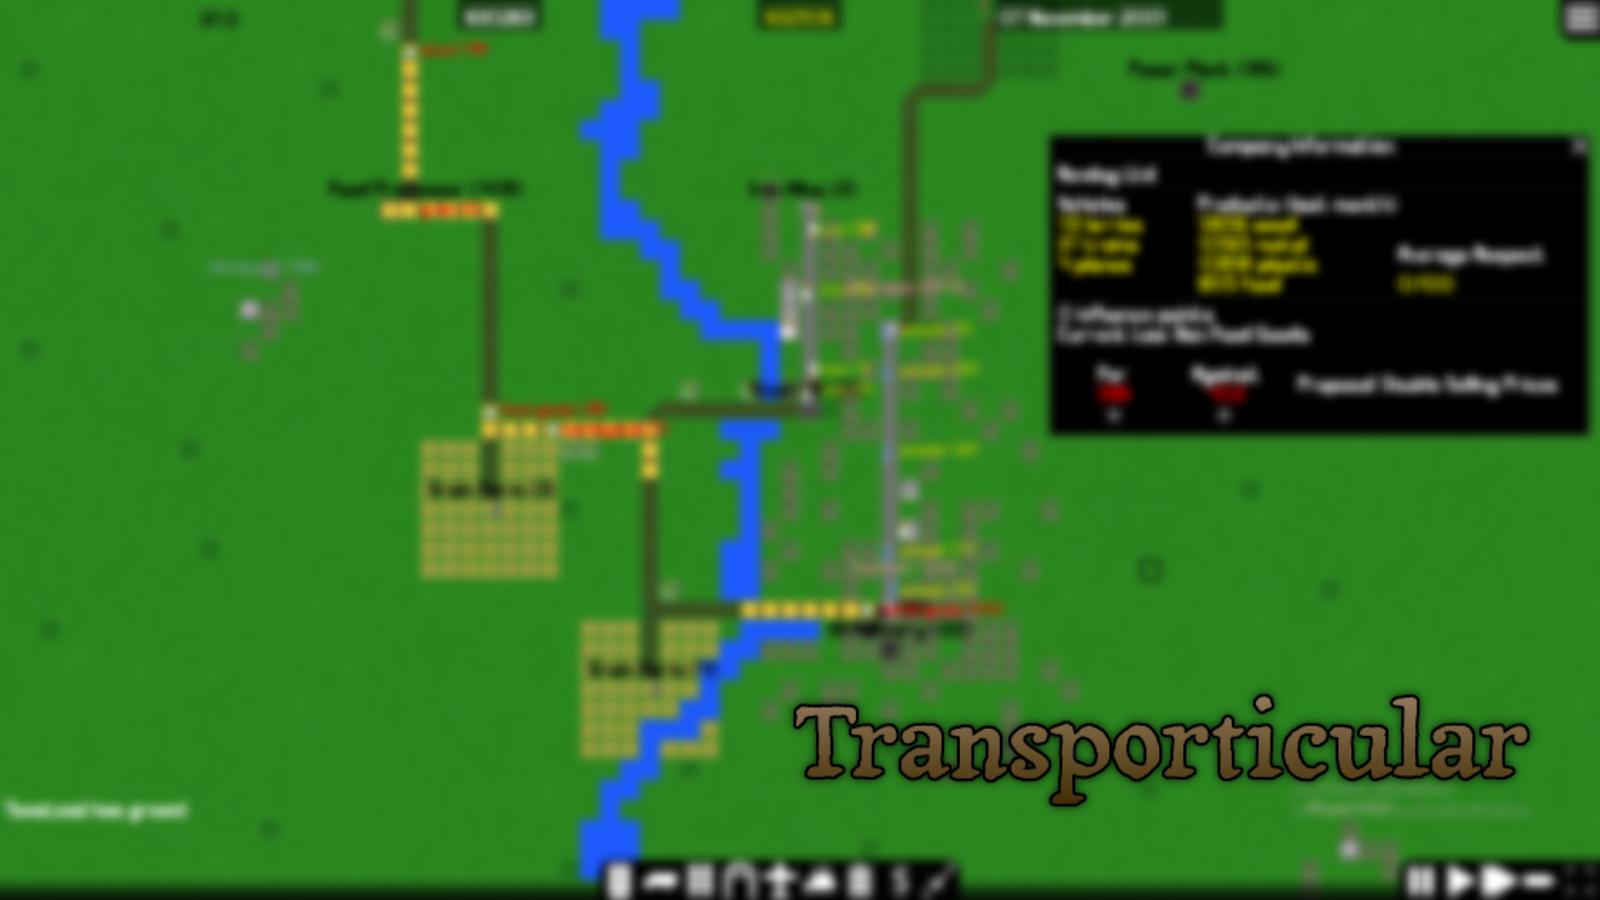 Transporticular